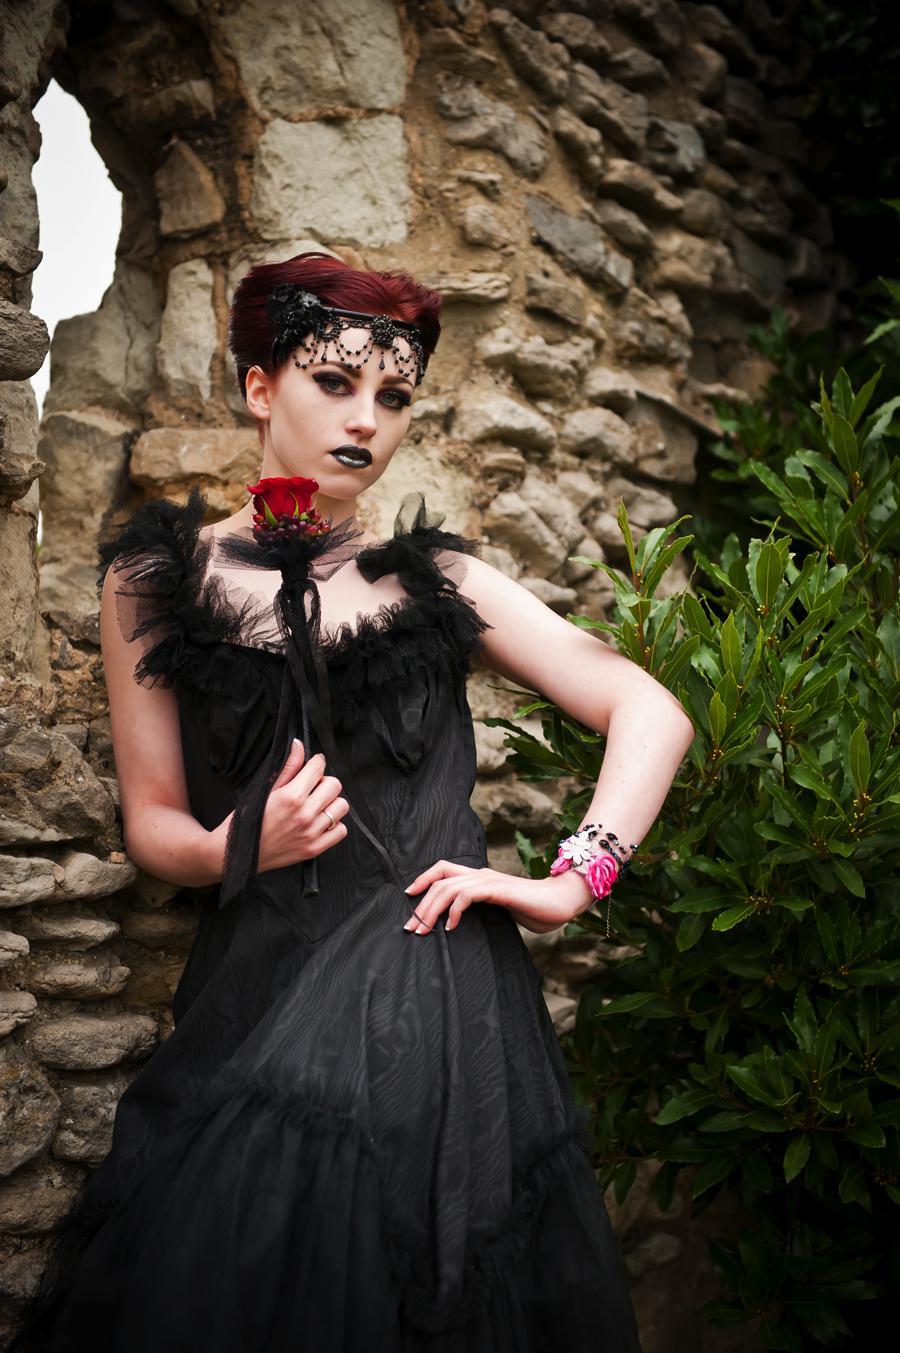 Victorian Gothic Wedding Dresses 25 Popular AliceInWeddingland Vintage gothic photo